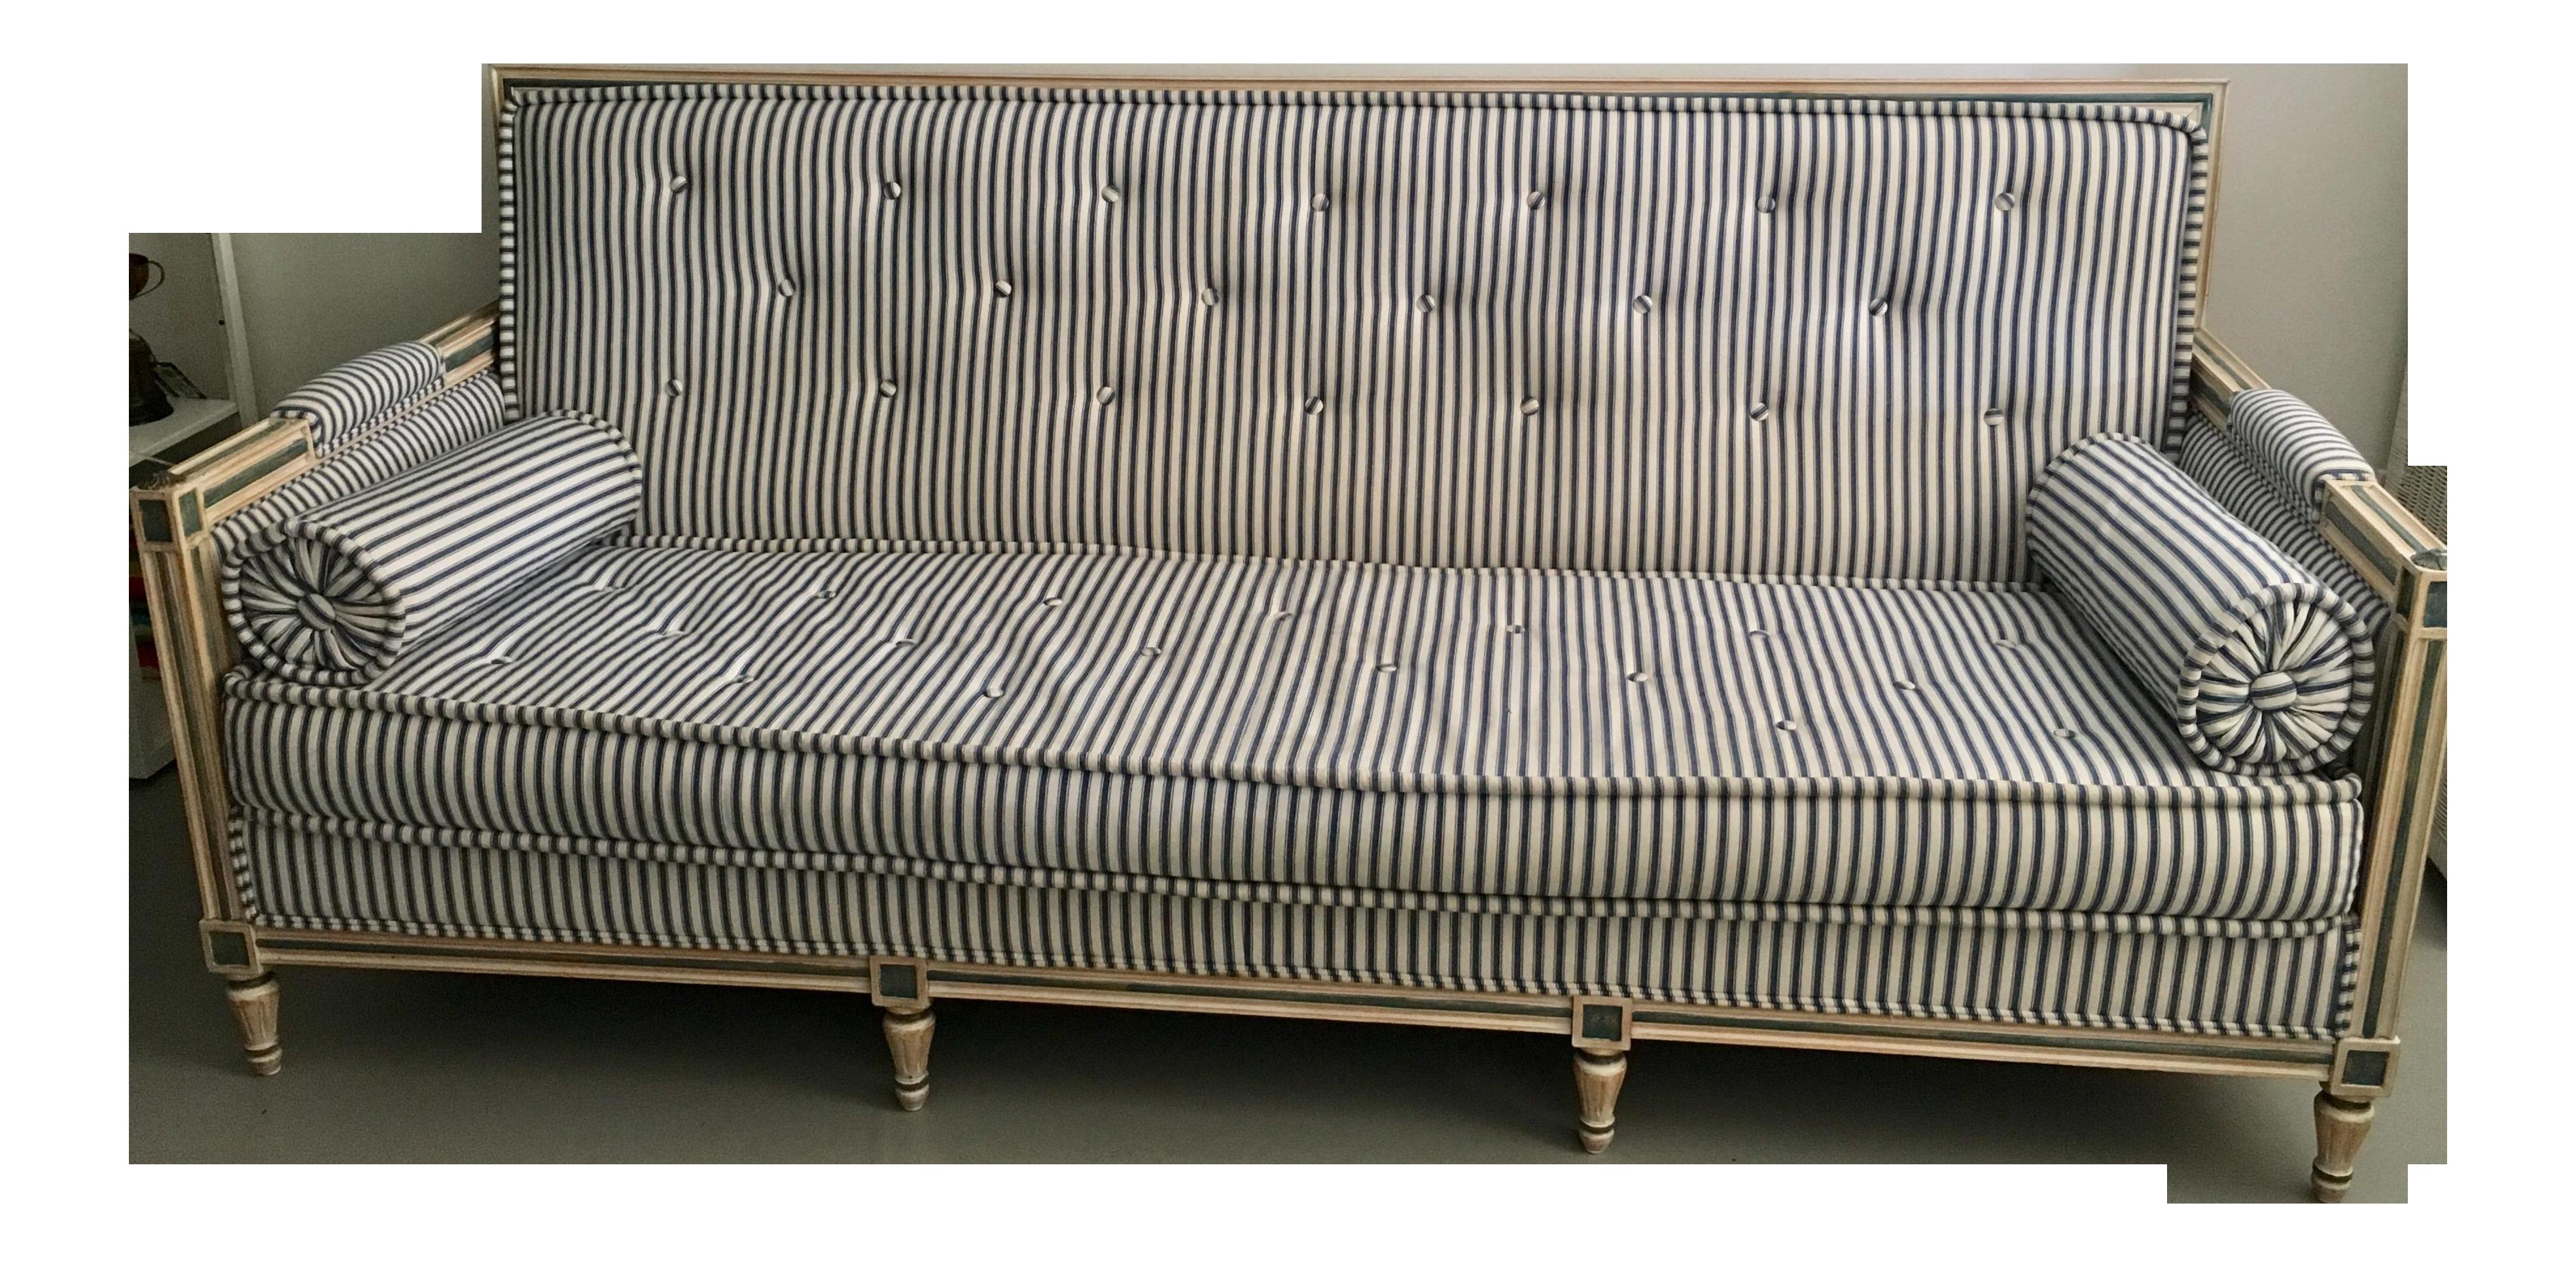 Vintage French Striped Sofa Chairish